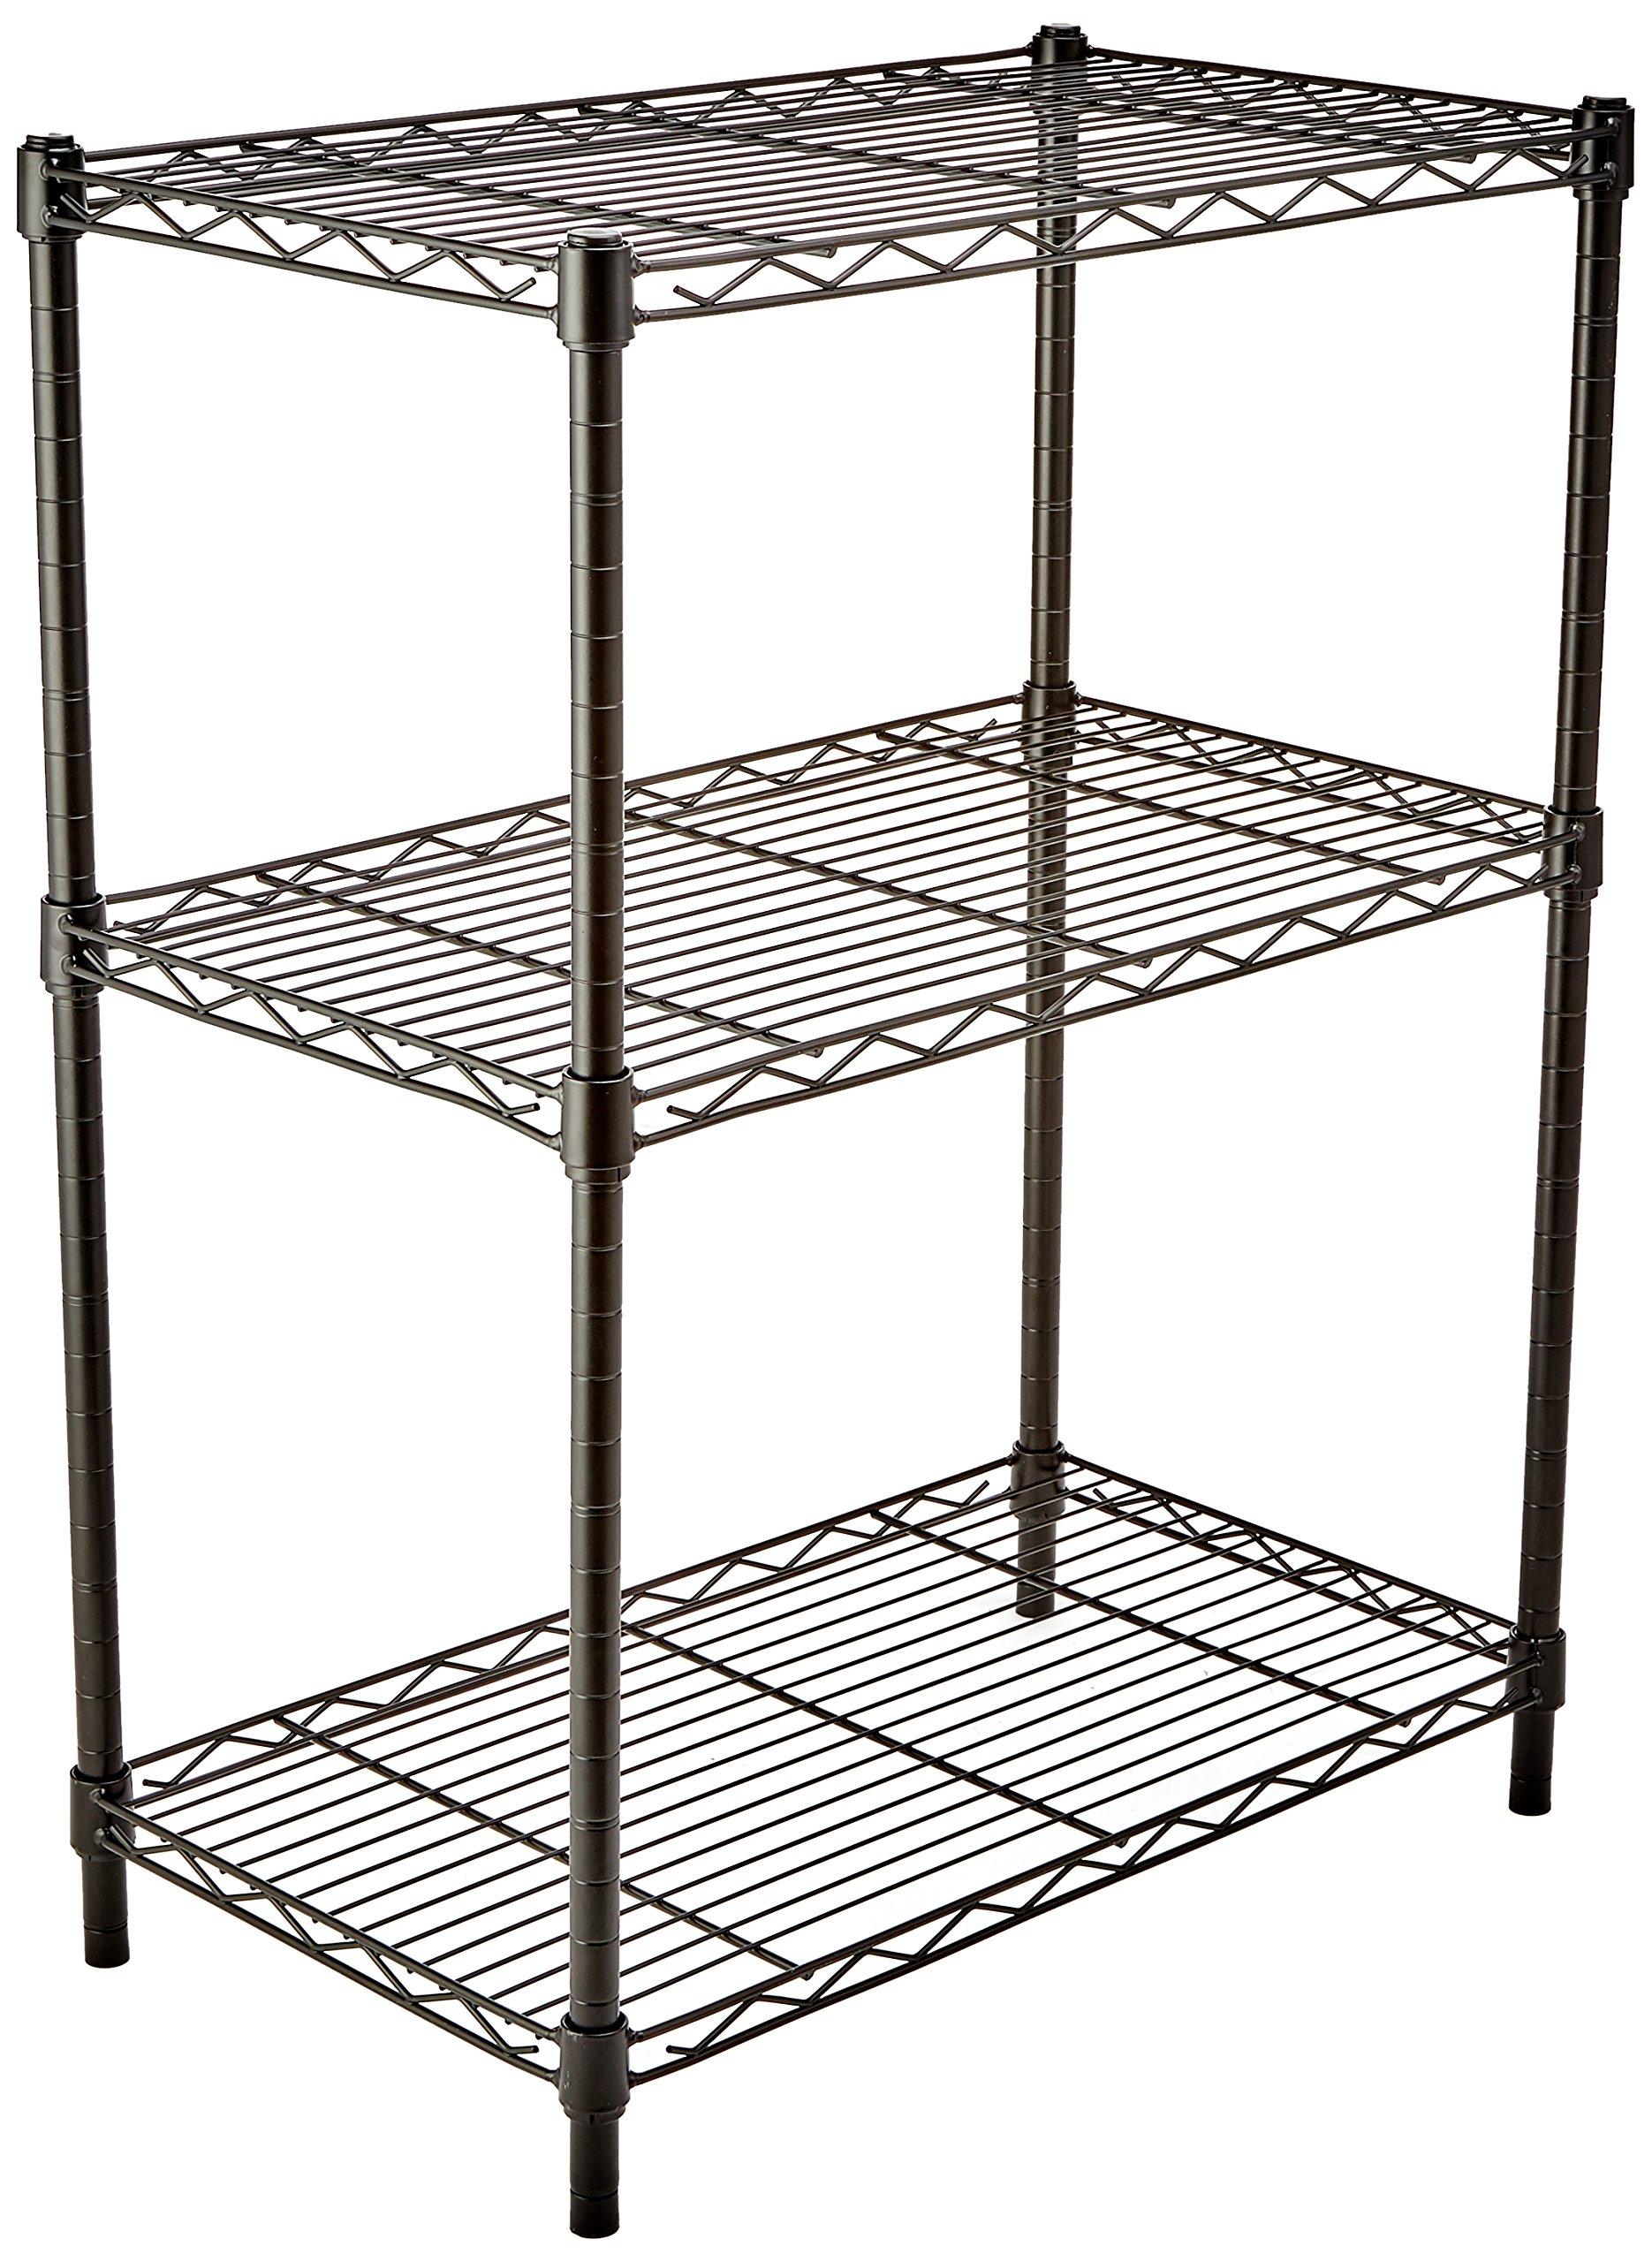 AmazonBasics 3-Shelf Shelving Storage Unit, Metal Organizer Wire Rack, Black by AmazonBasics